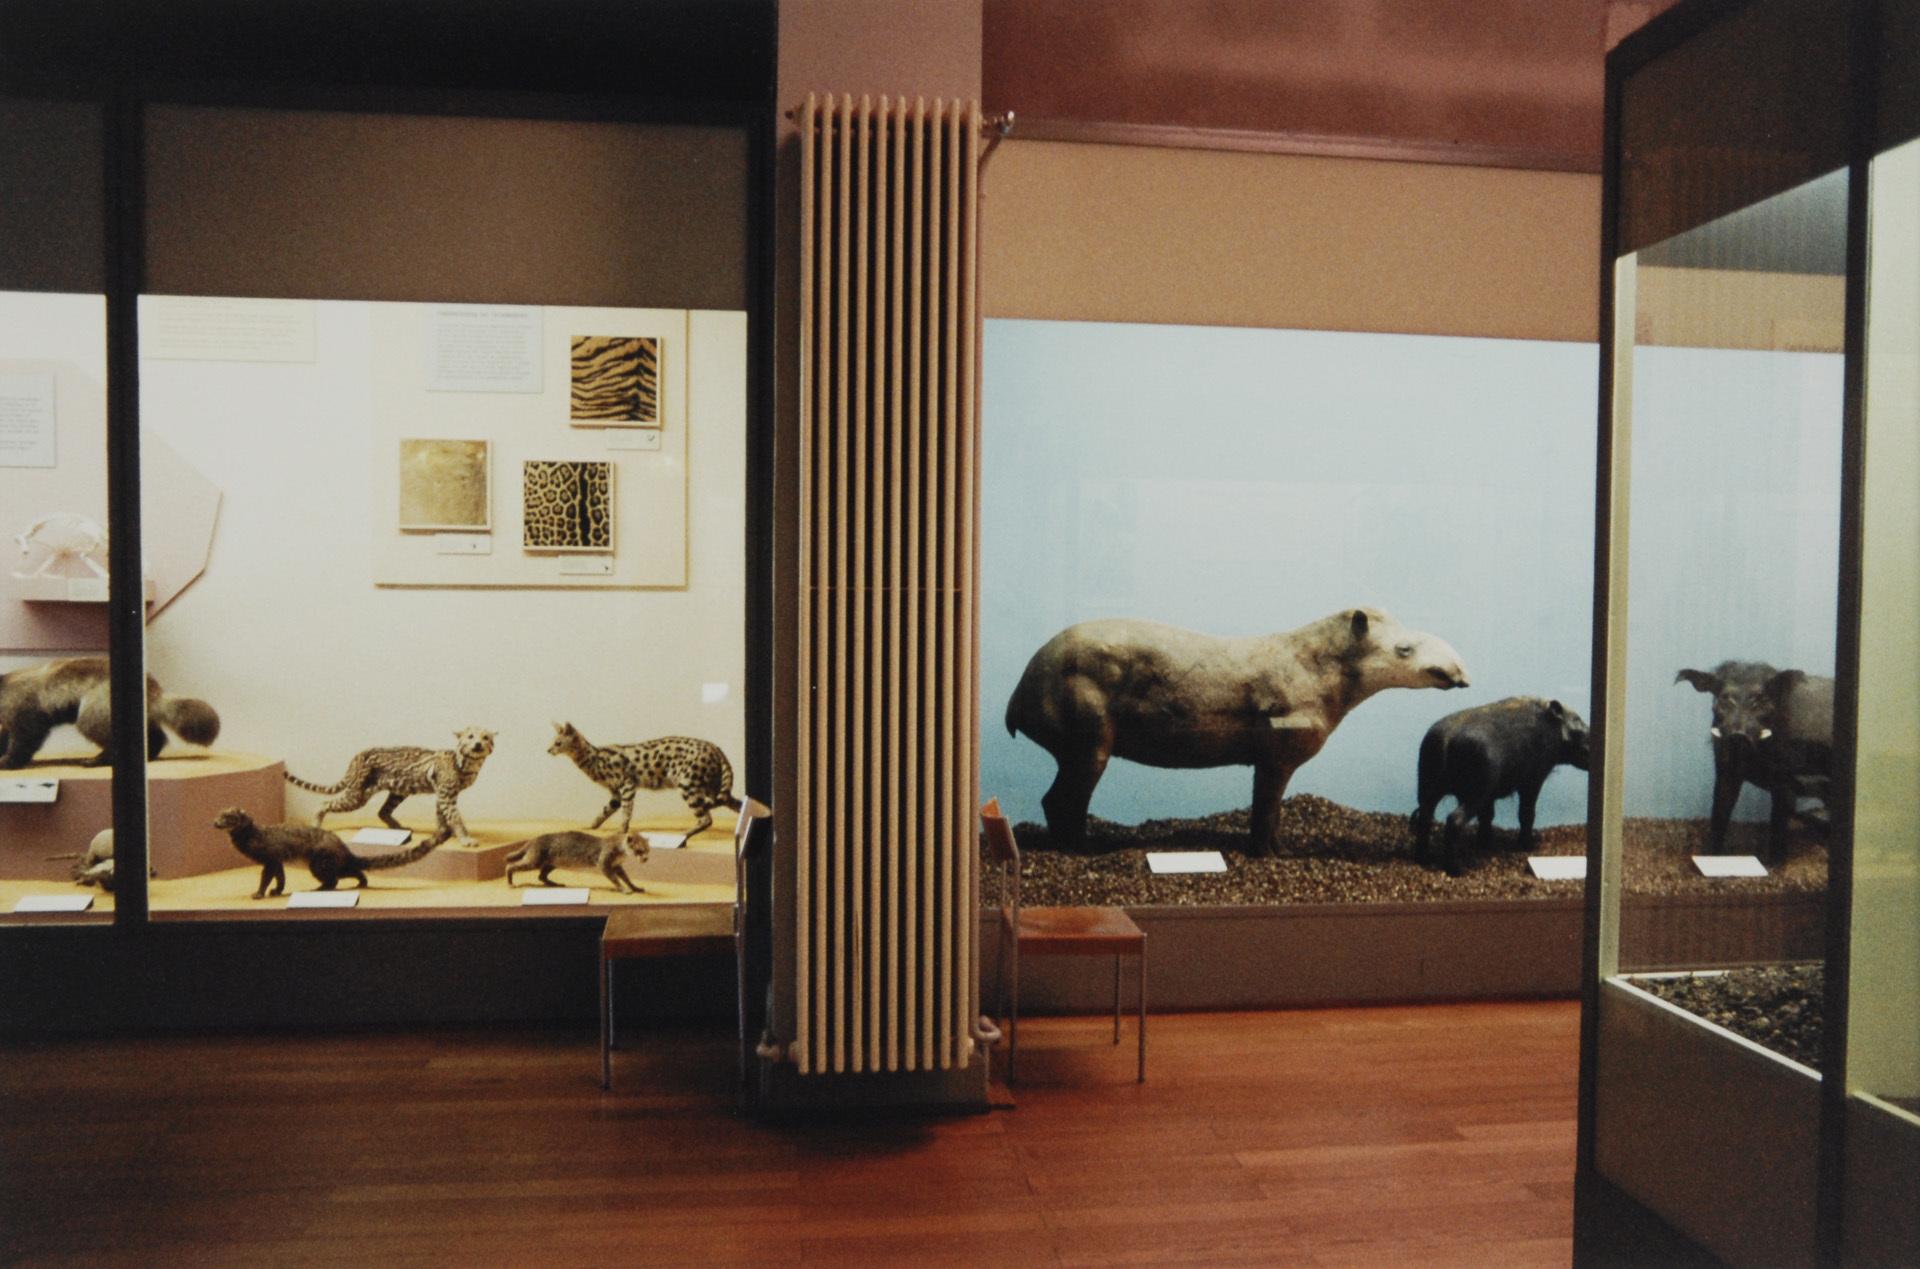 Höfer Candida, Naturhistorisches Museum Basel